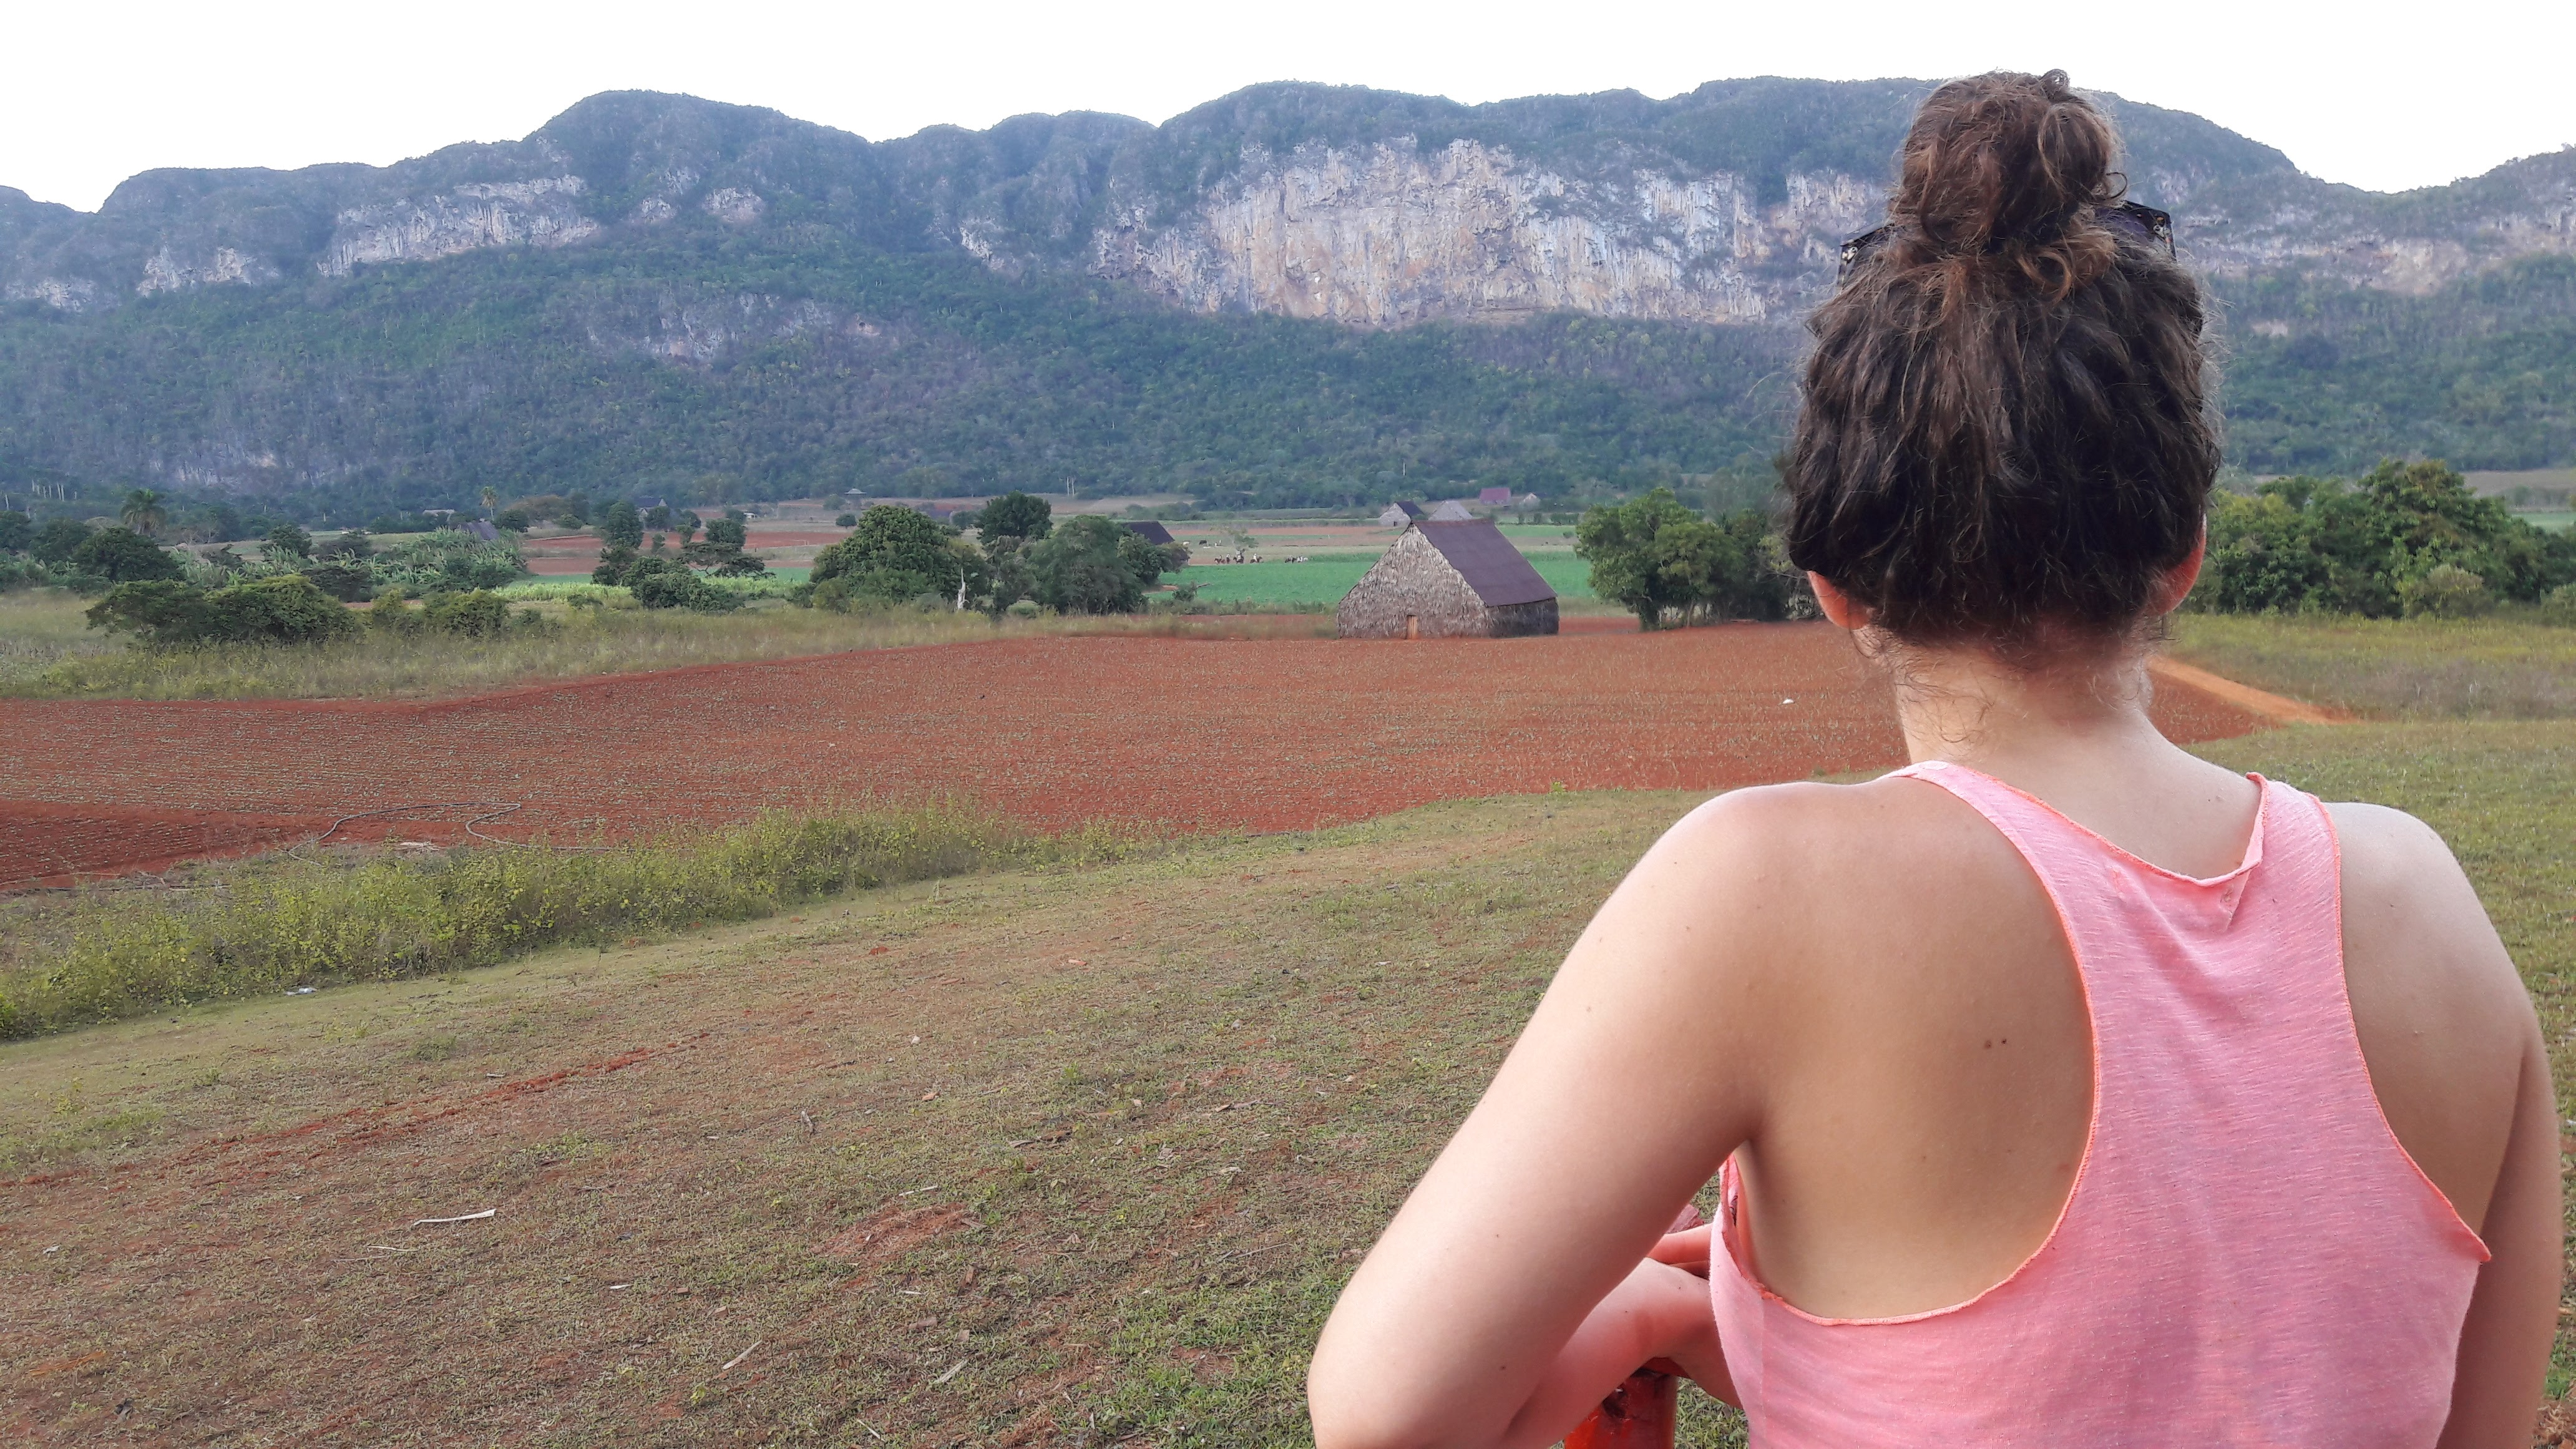 terrazza-panoramica-parco-nazionale-viñales-cuba